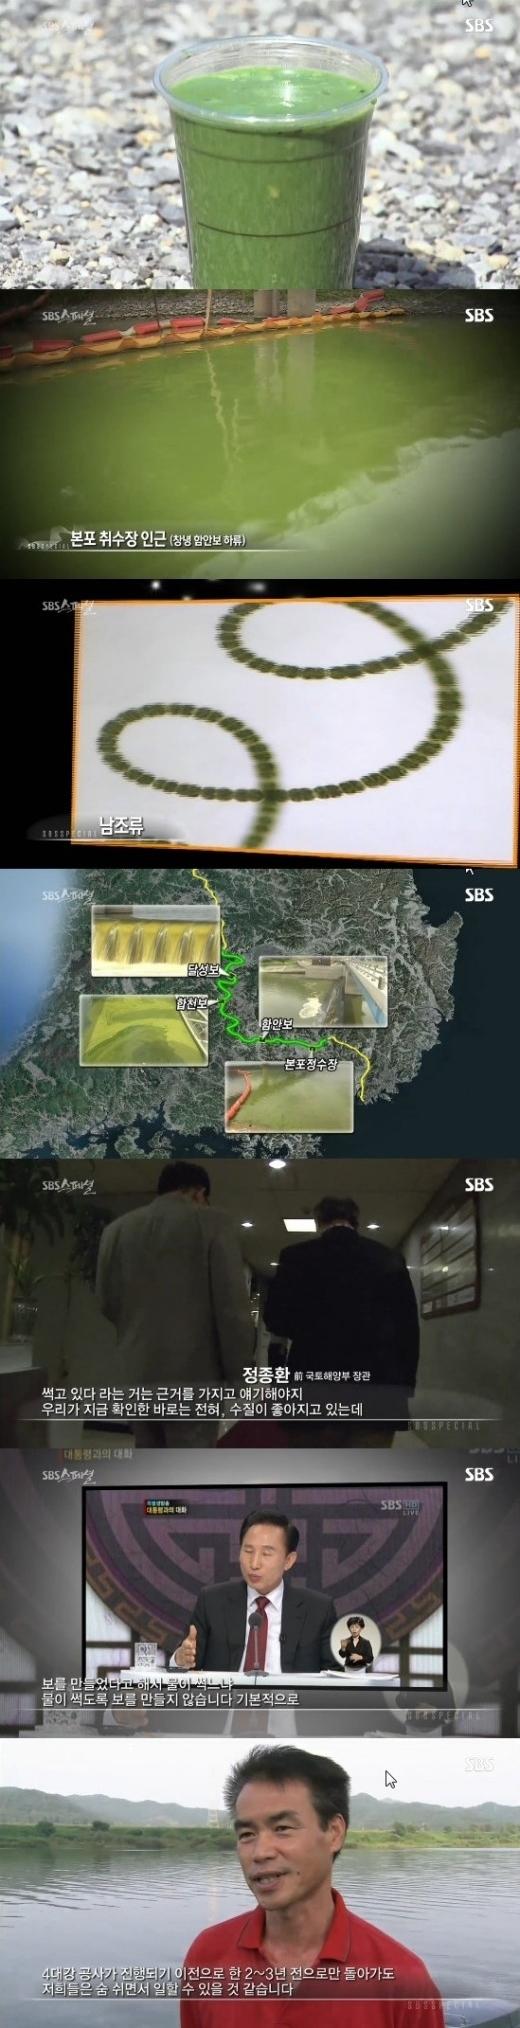 SBS 스페셜 '4대강의 반격' 방송화면